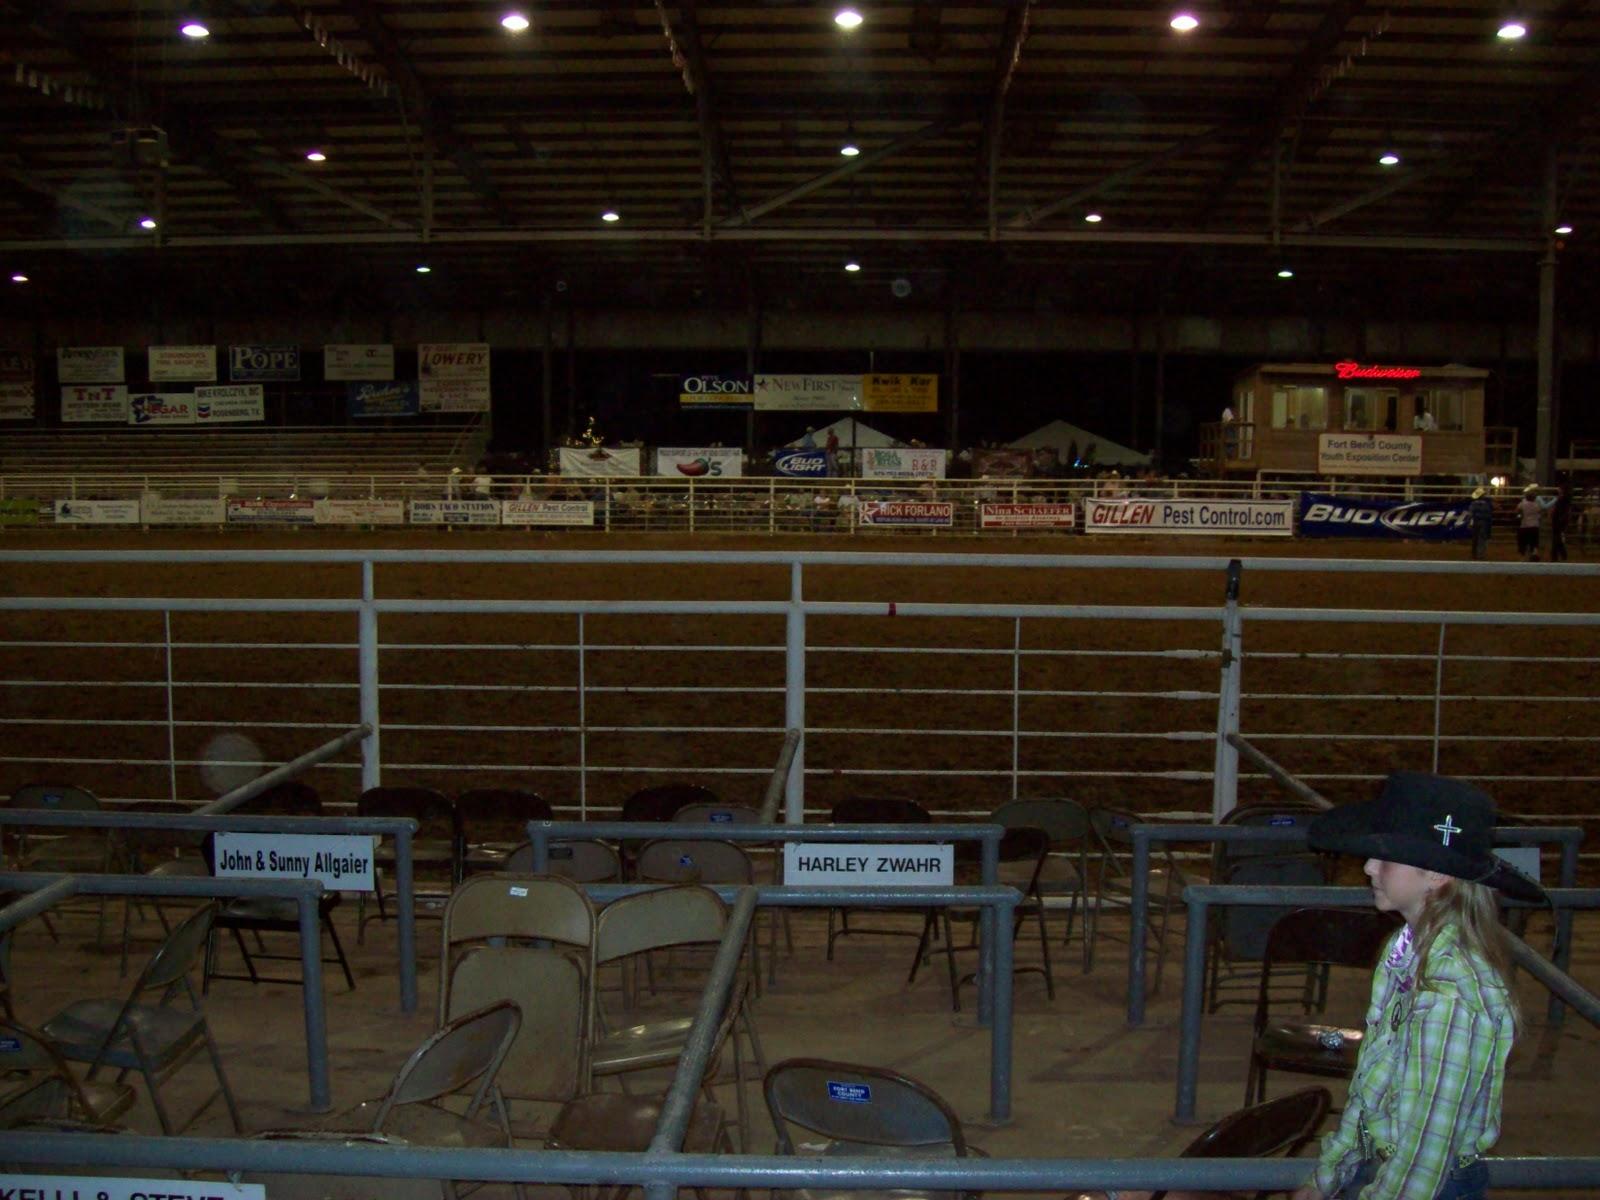 Fort Bend County Fair - 101_5460.JPG